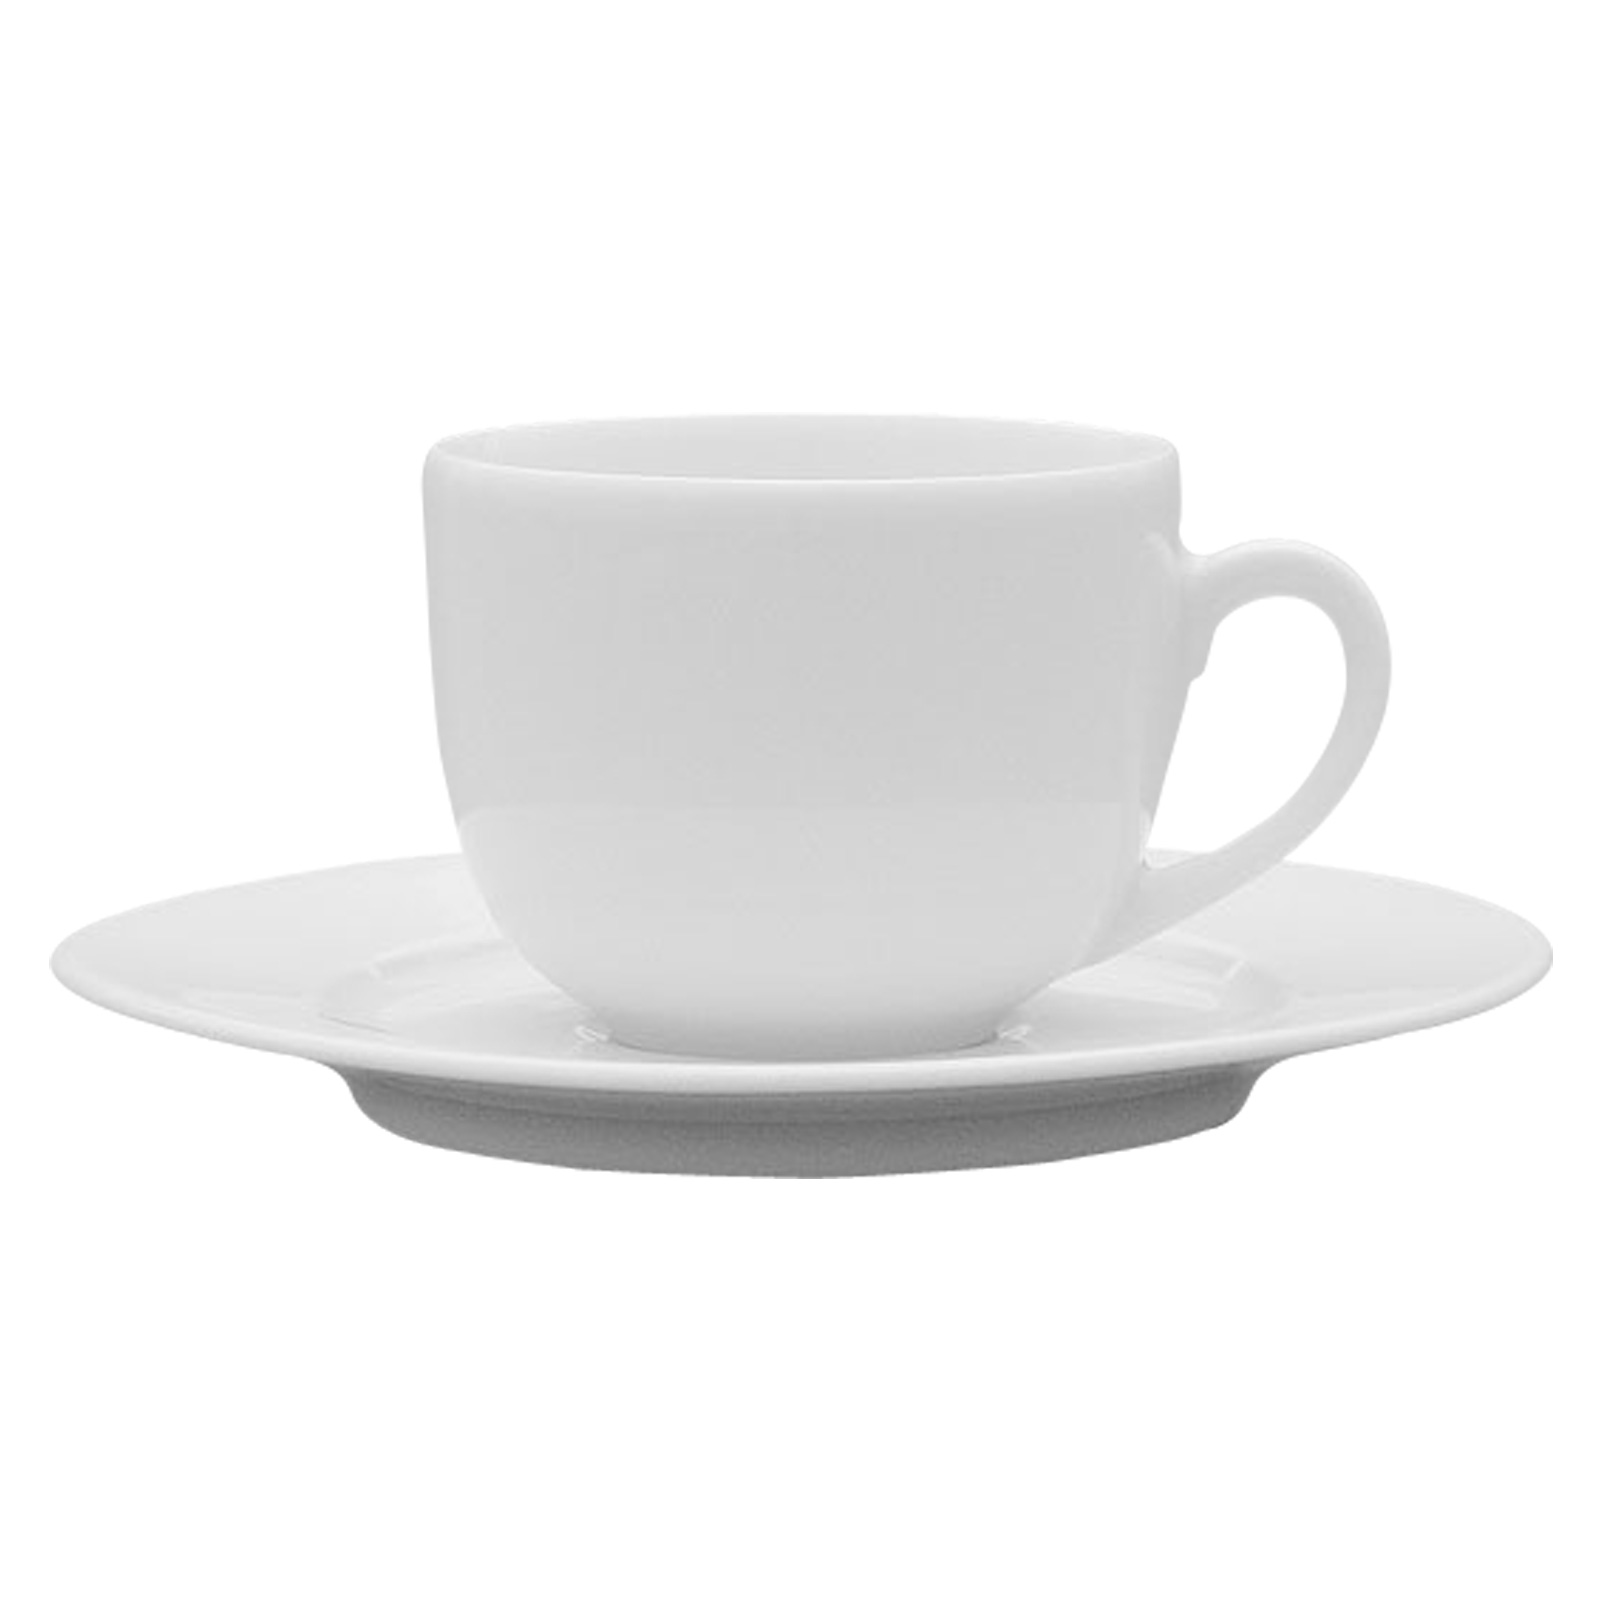 Sonia Coffee Saucer